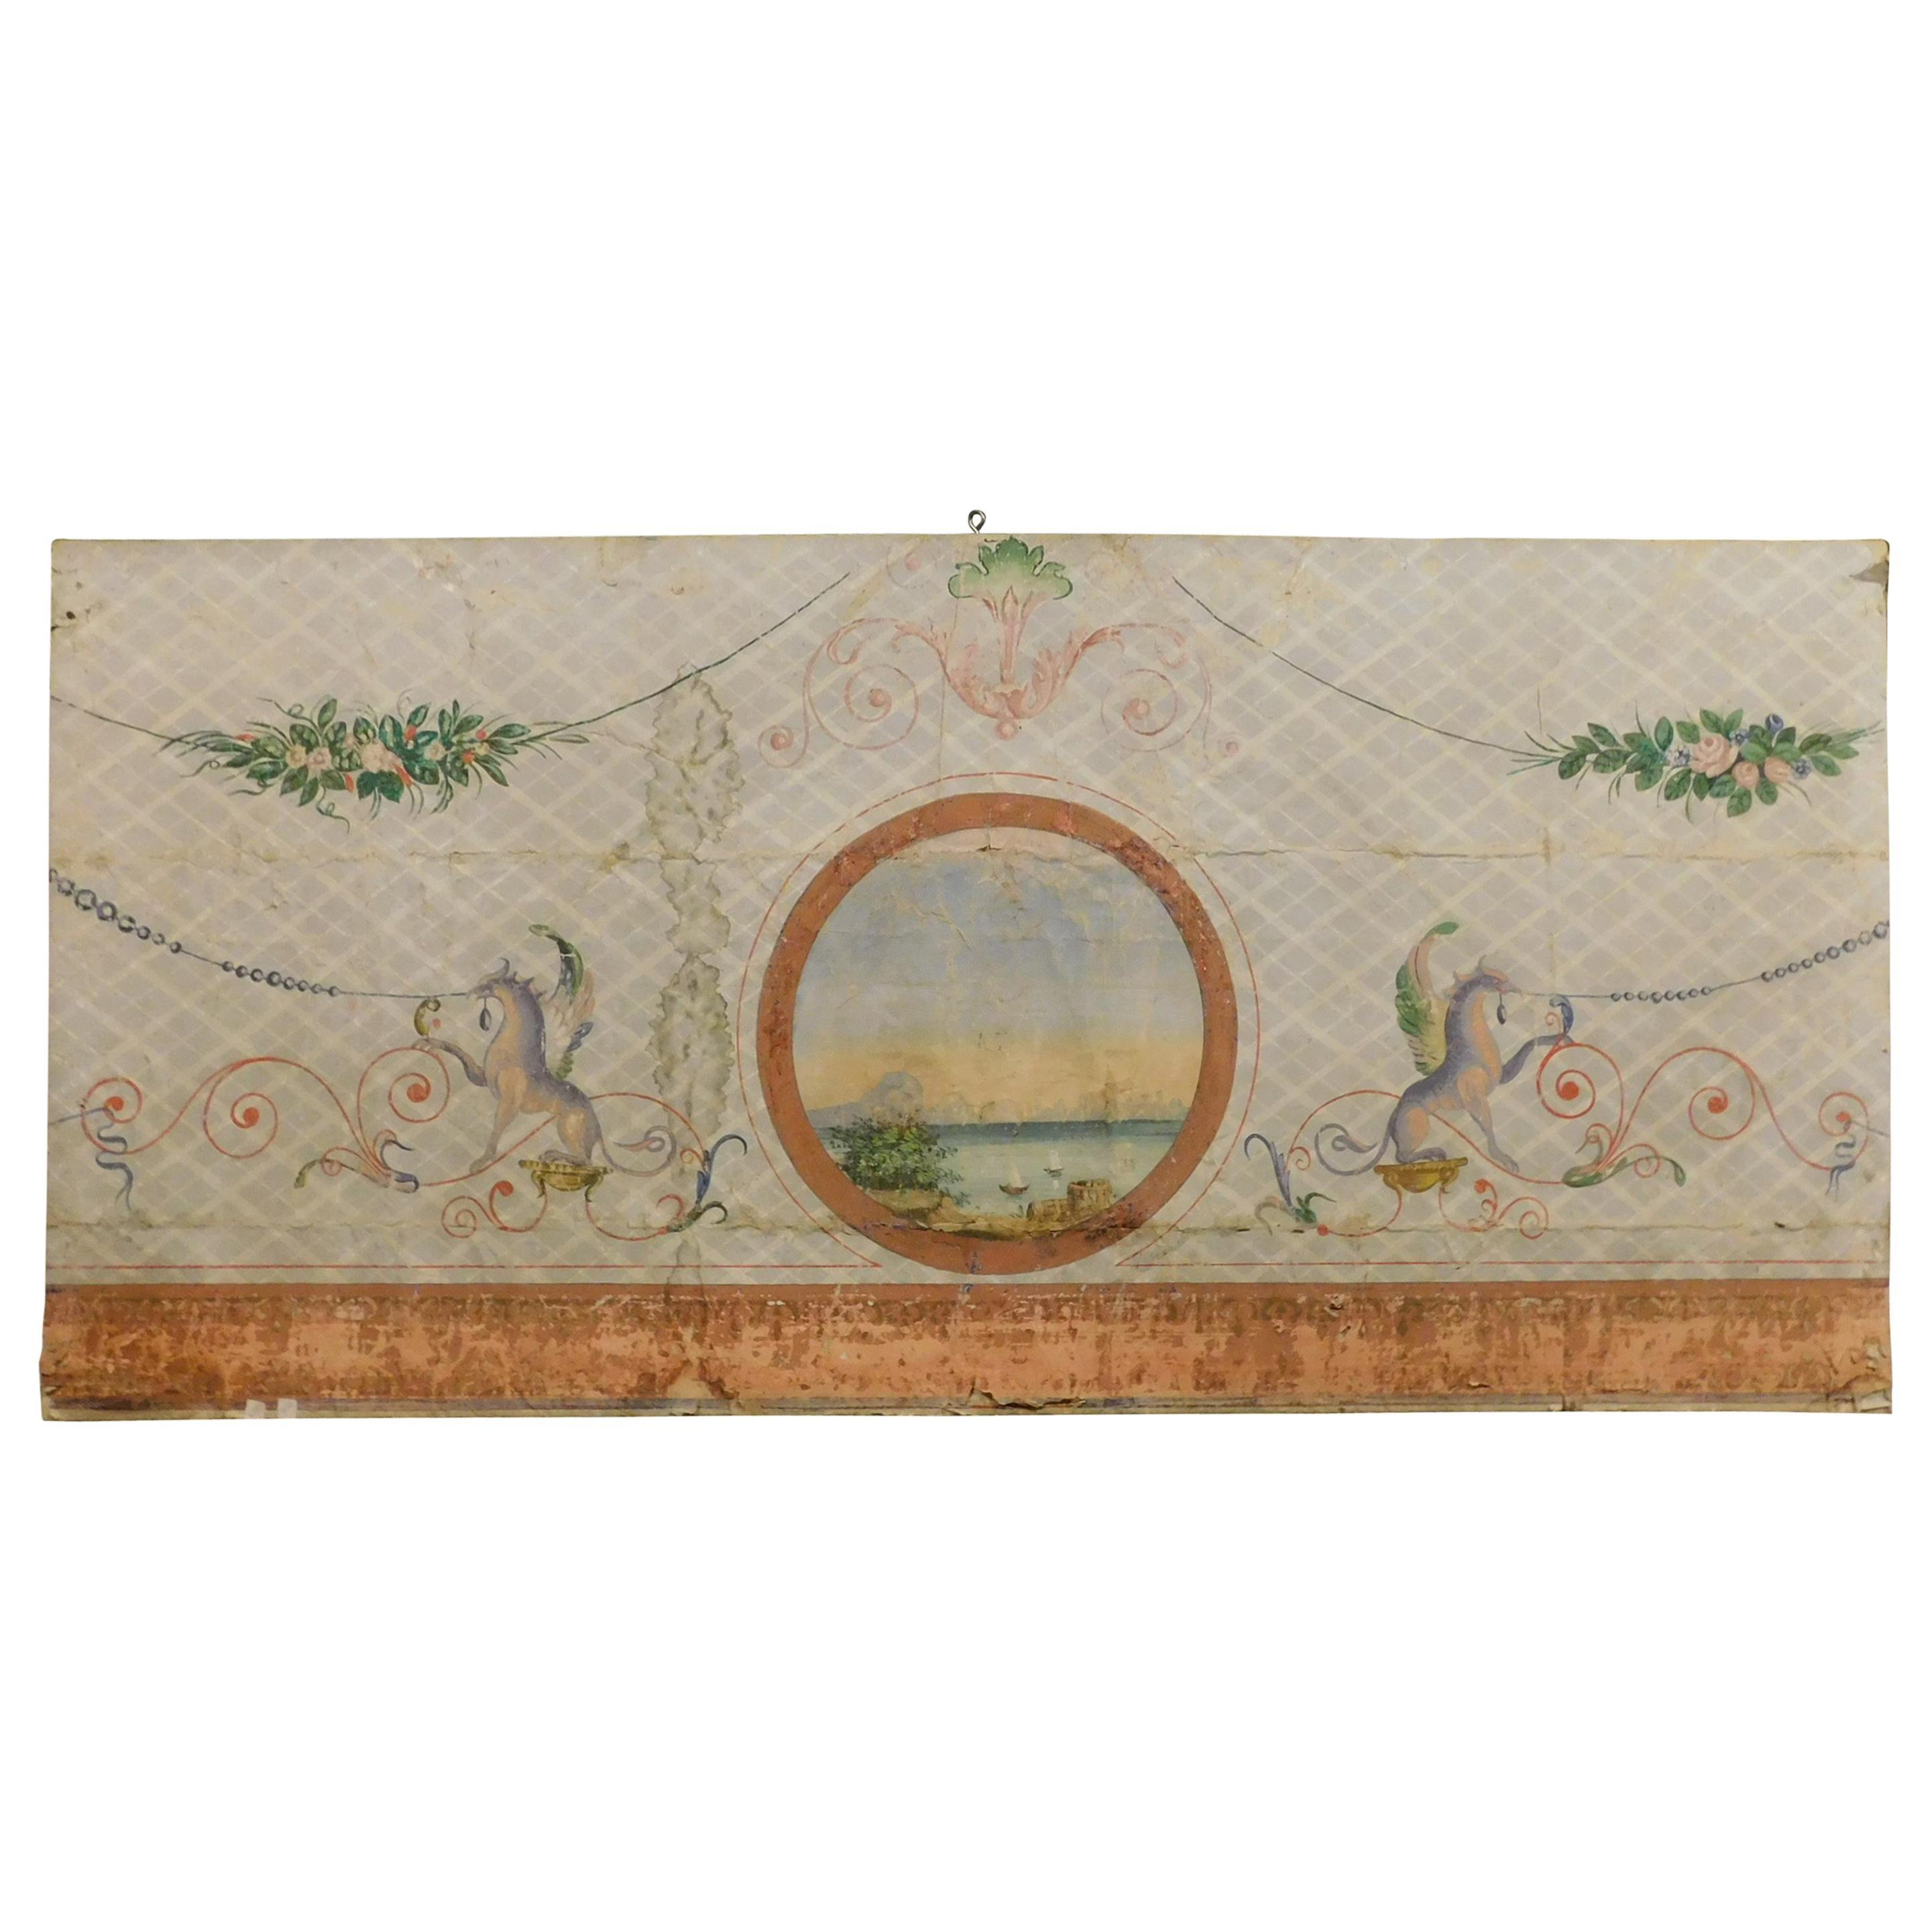 19th Century Antique Decorative Panel on Paper